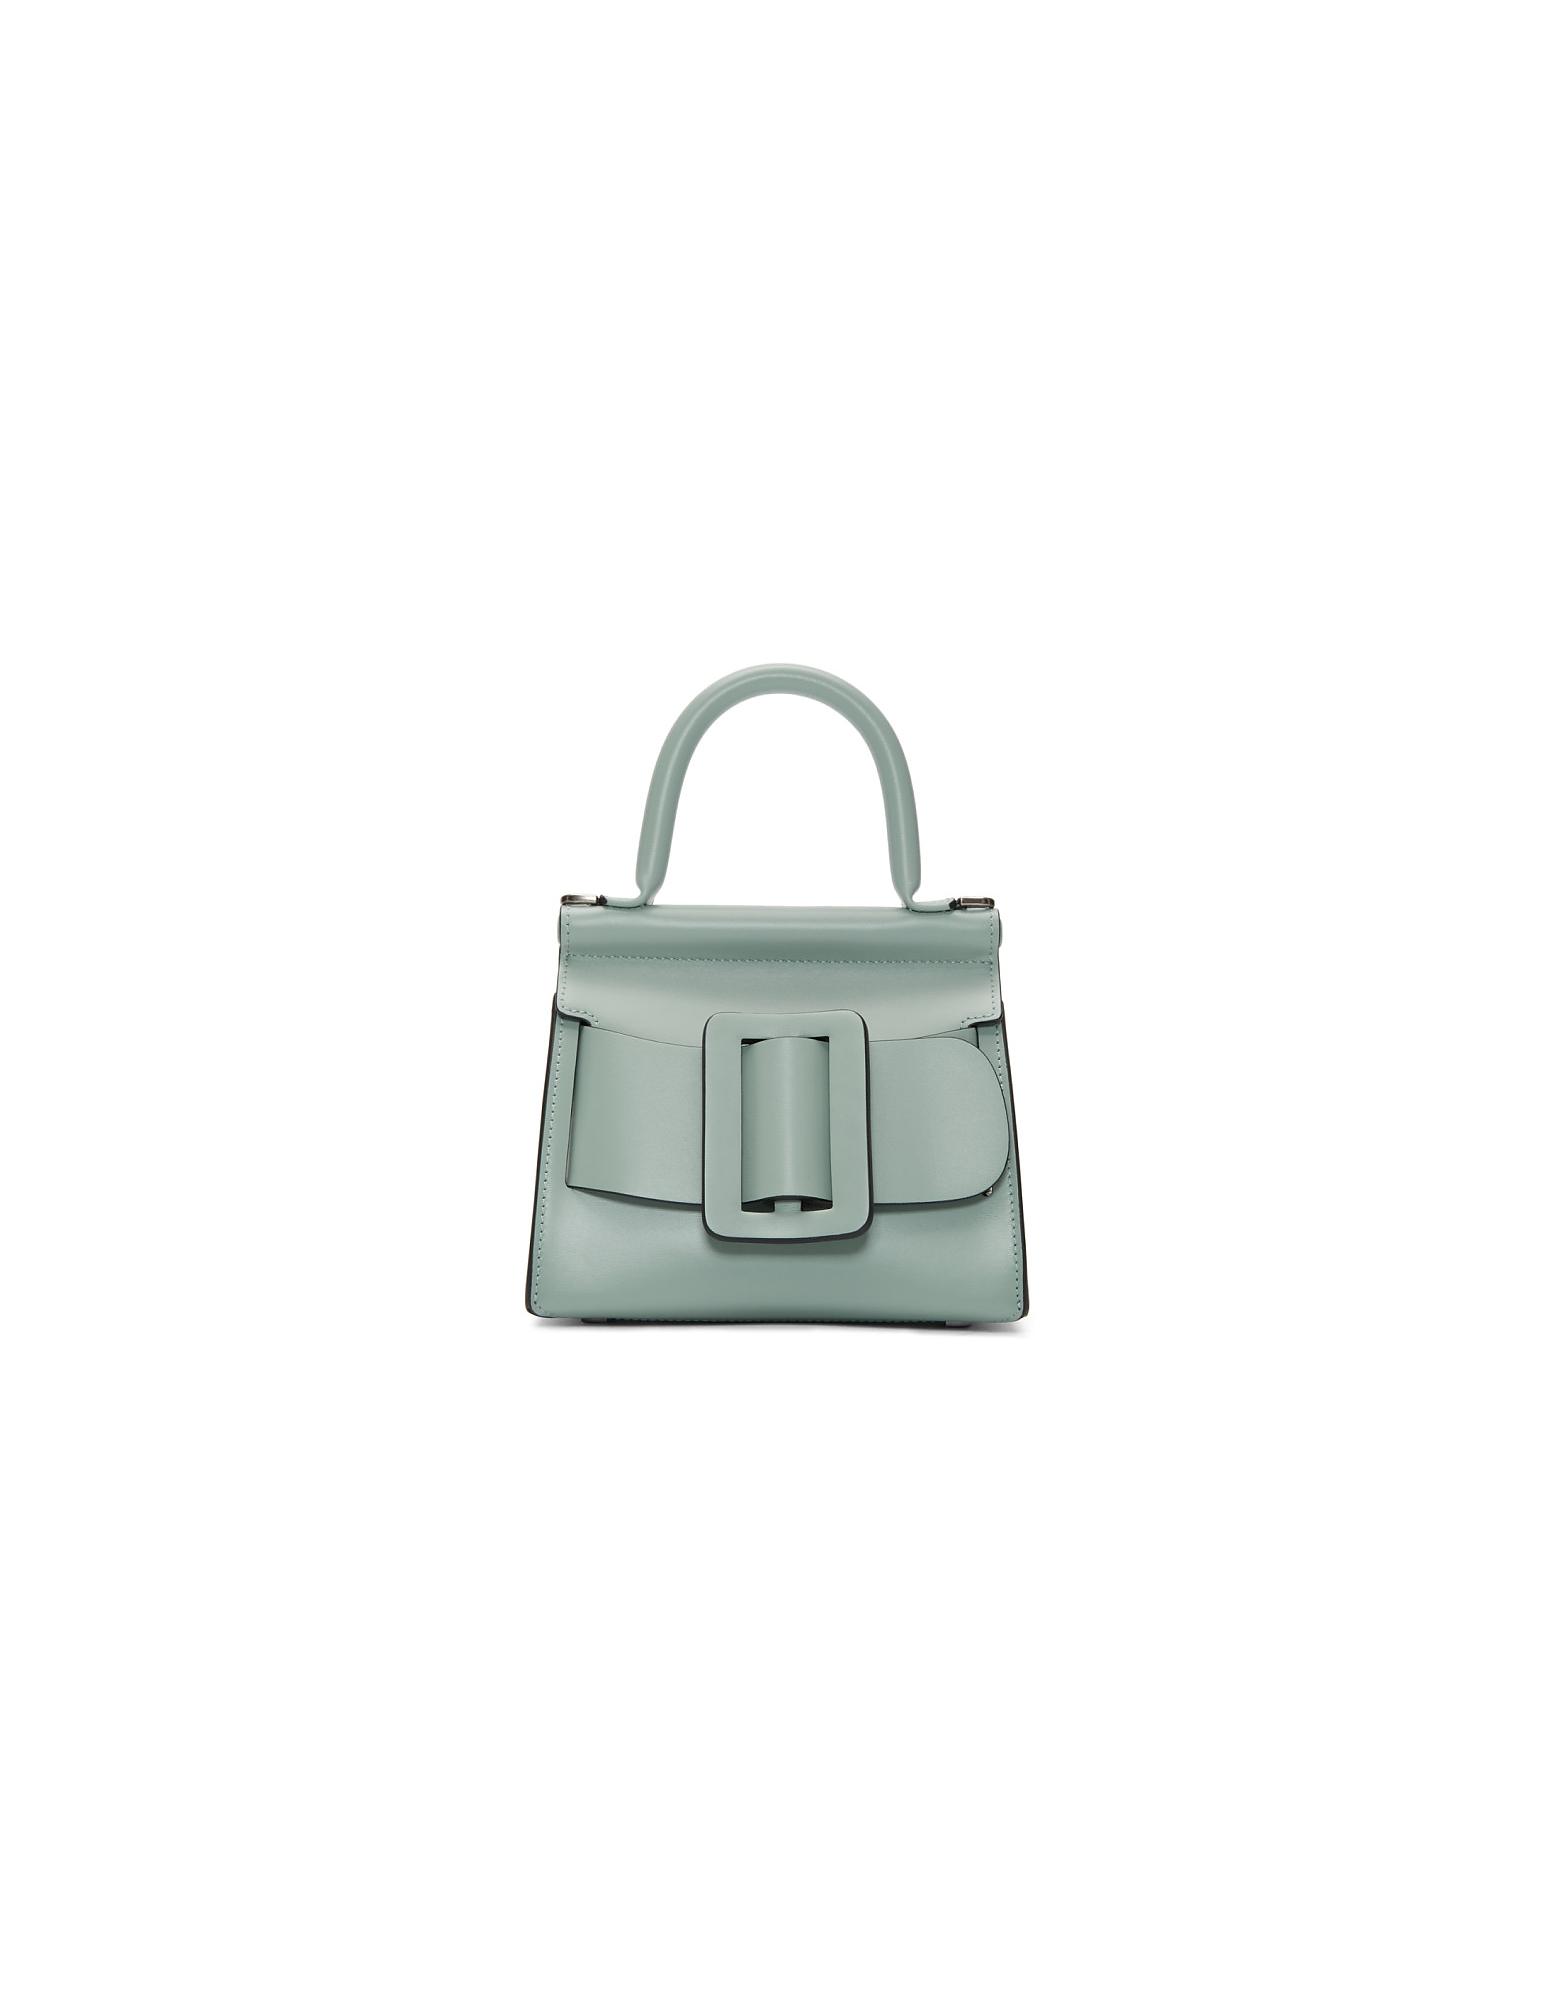 BOYY Designer Handbags, Blue Karl 19 Bag